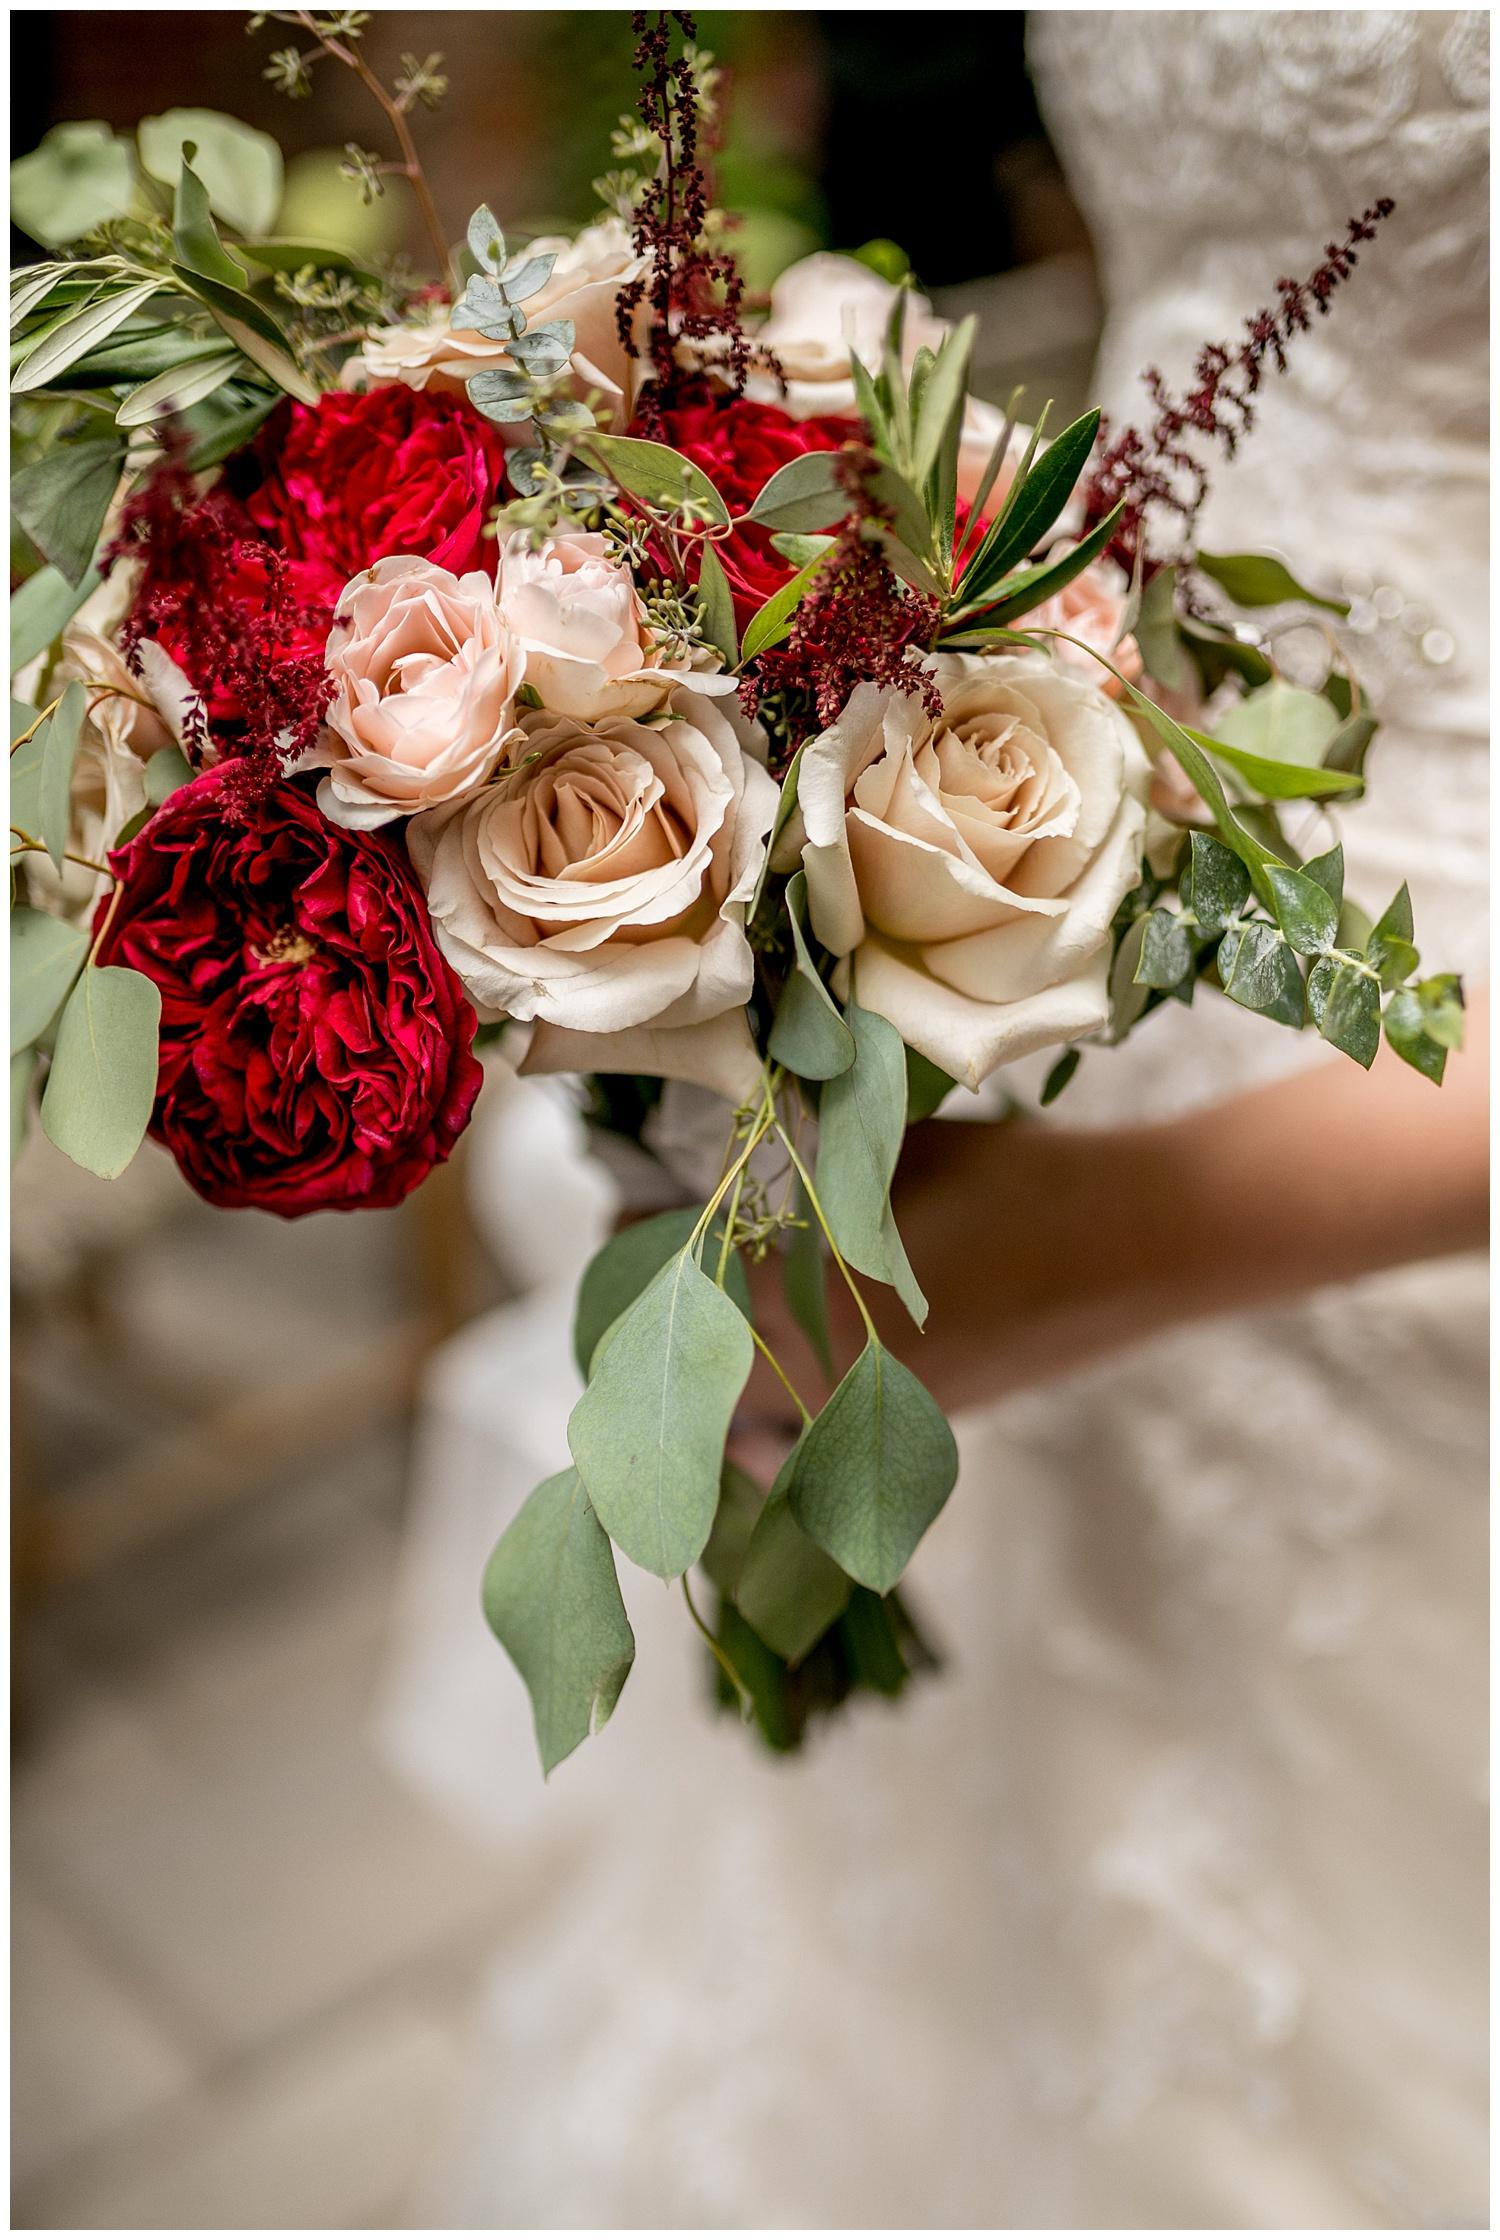 TheSmythCollective-Best-Cincinnati-Wedding-Photographer-Urban-Downtown-Covington-Wedding-26.jpg